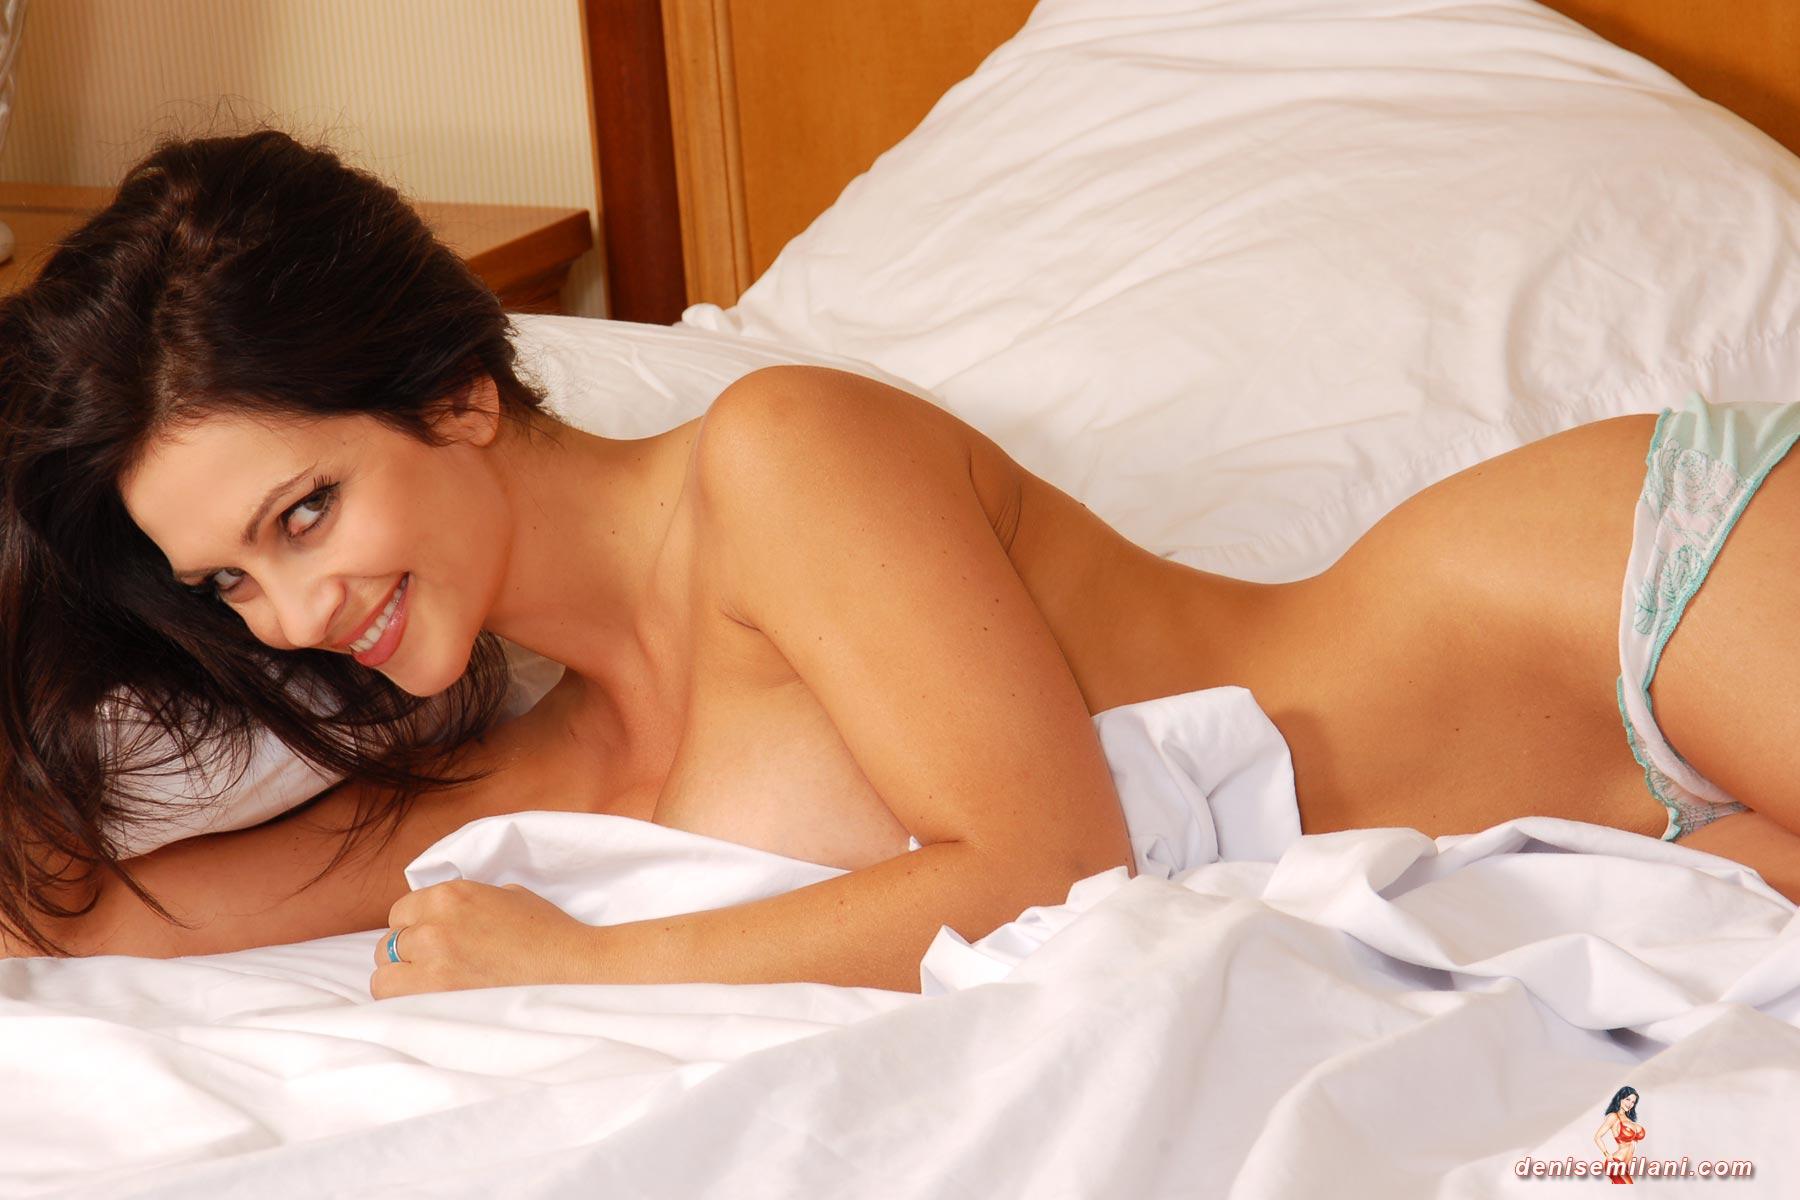 Denise milani nude blonde